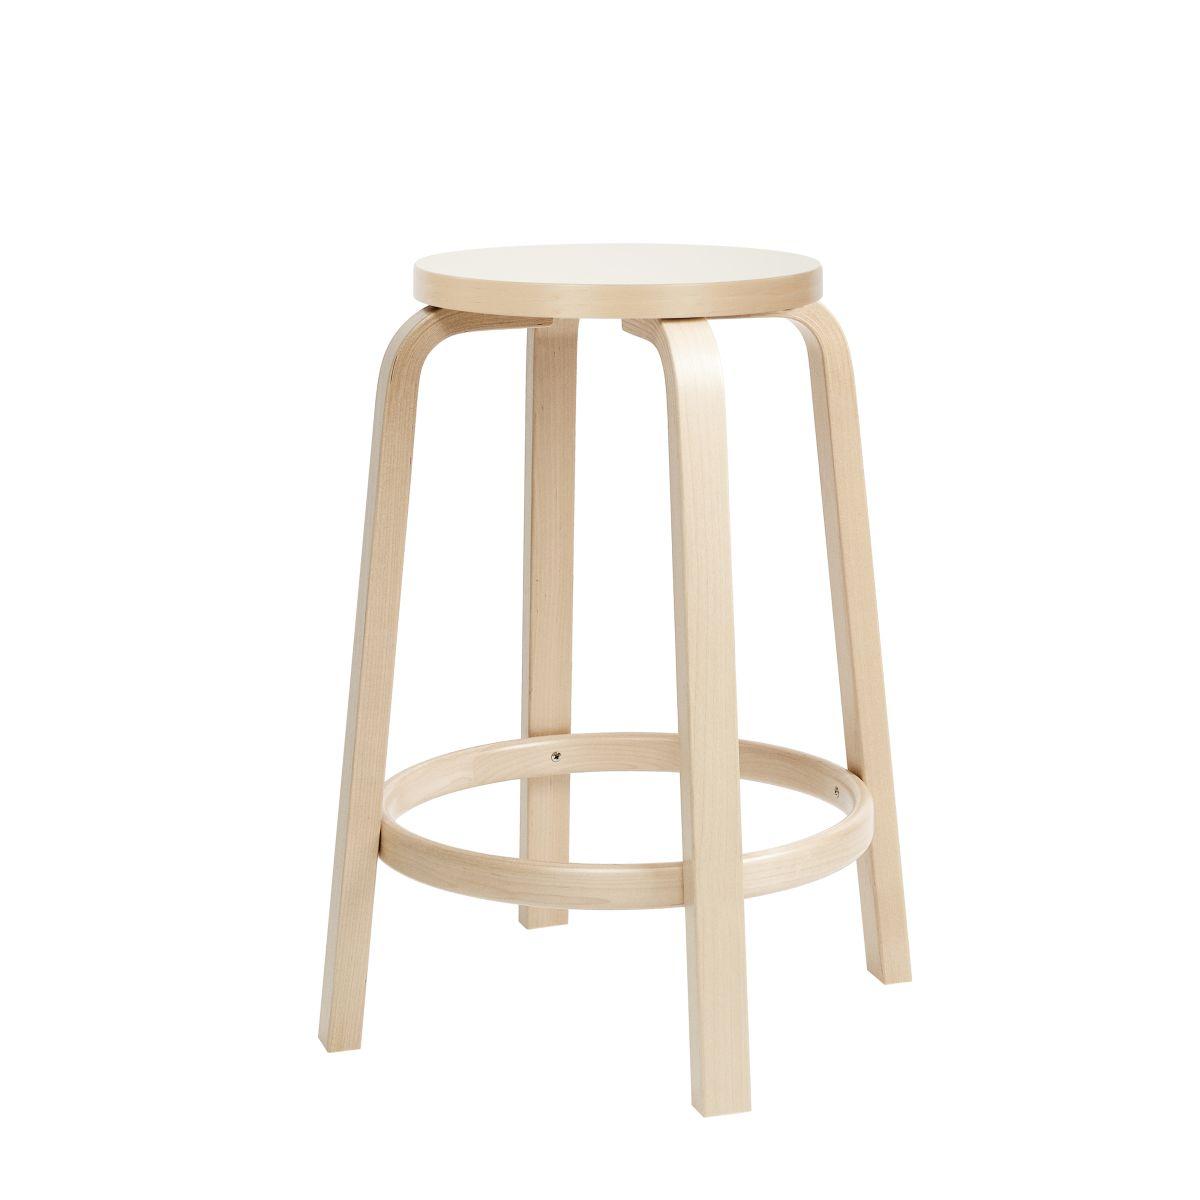 Bar Stool 64 65cm legs birch_top white HPL_sRGB